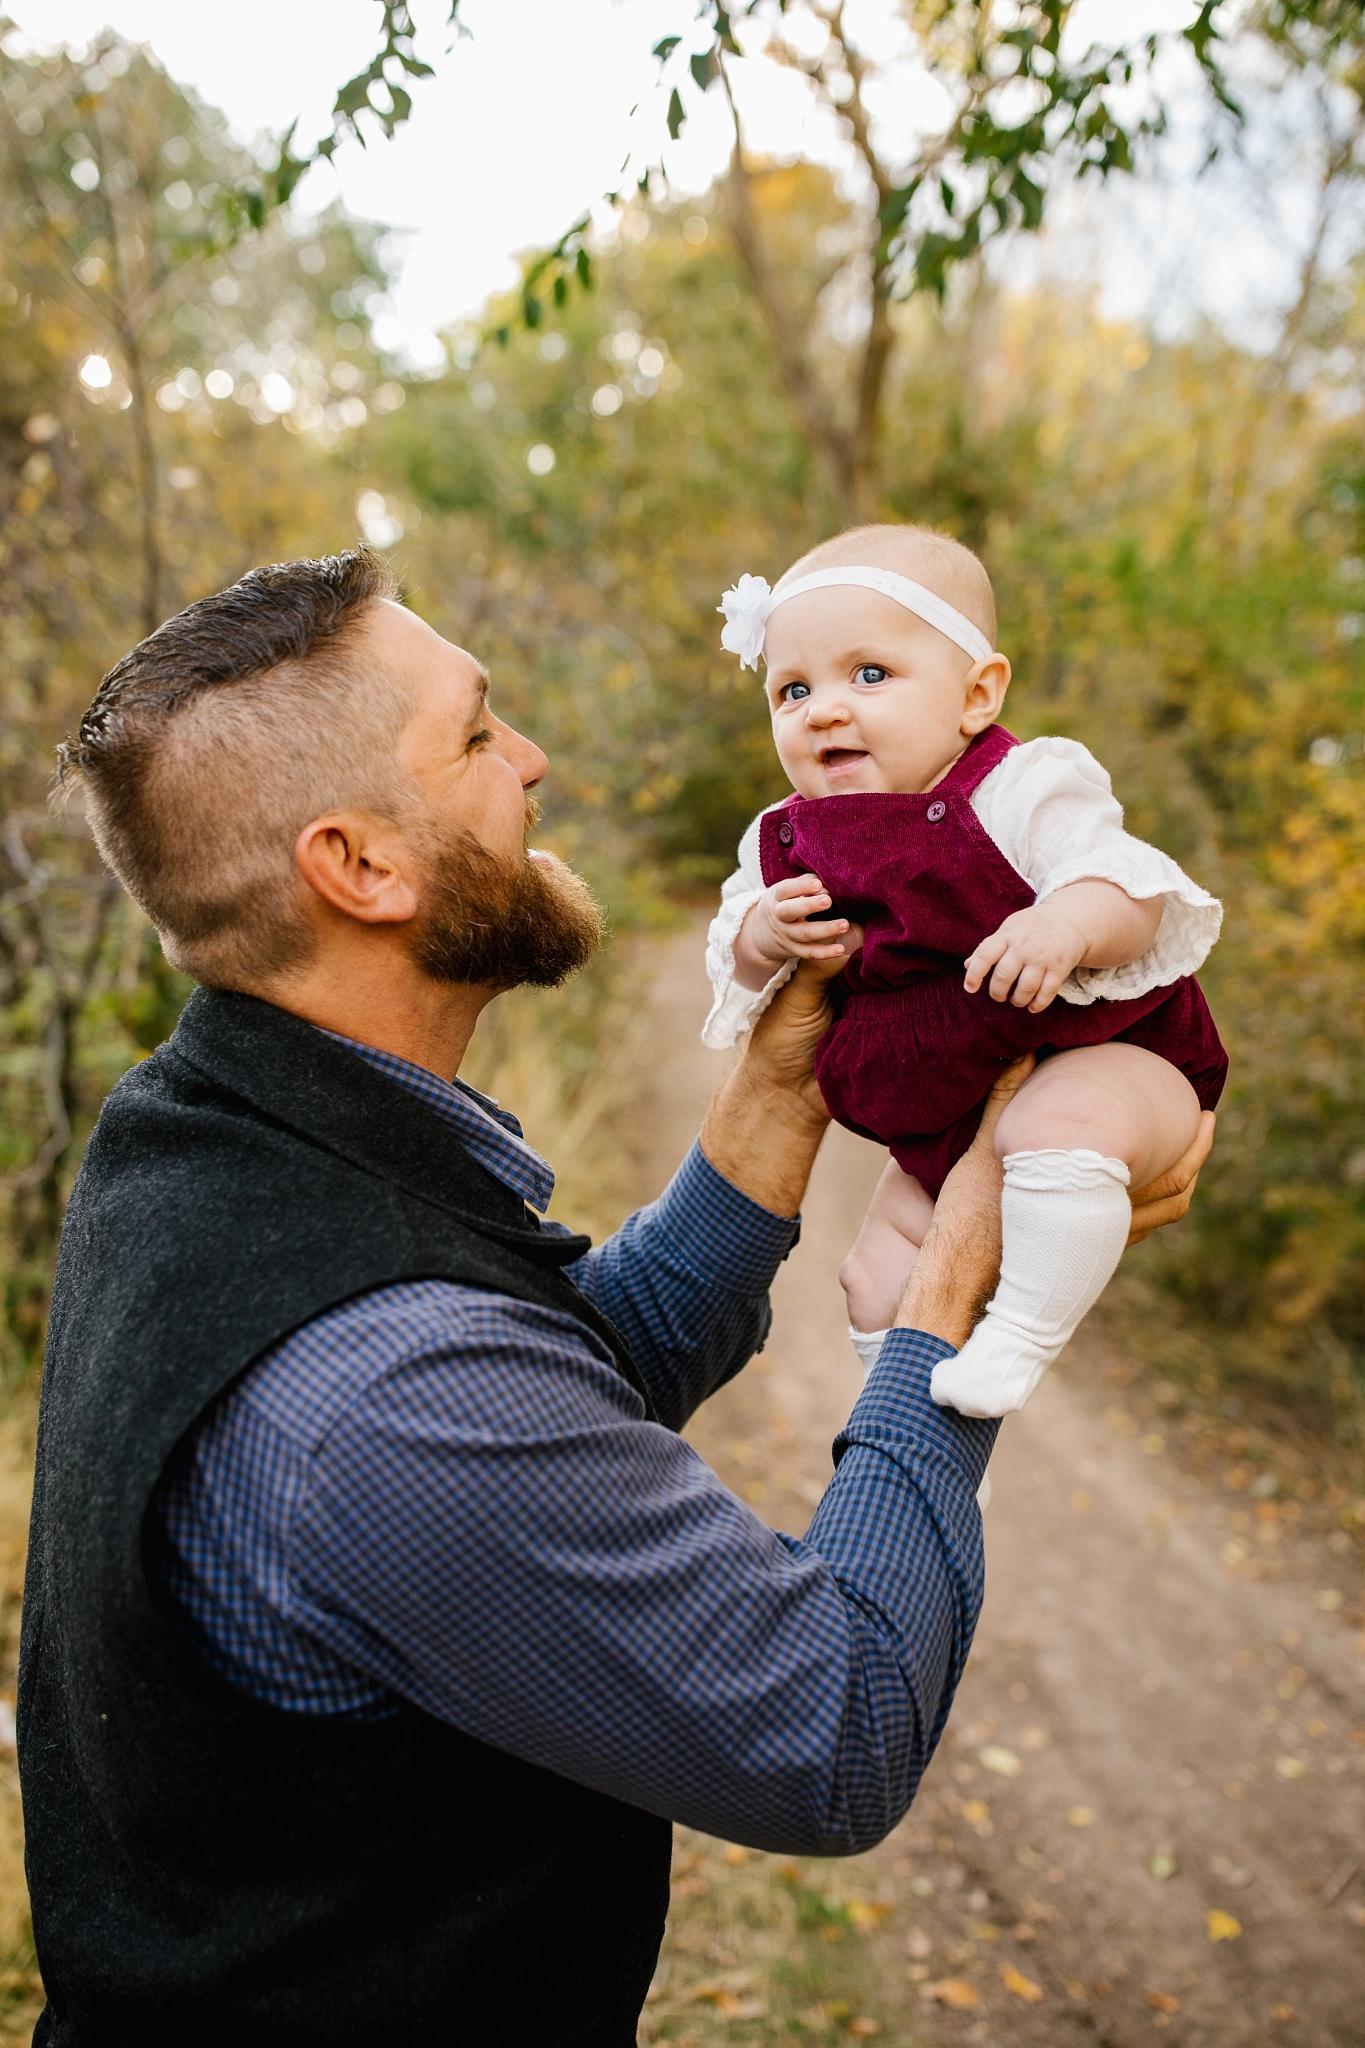 Matthews-66_Lizzie-B-Imagery-Utah-Family-Photographer-Park-City-Salt-Lake-City-Nephi-Utah.jpg